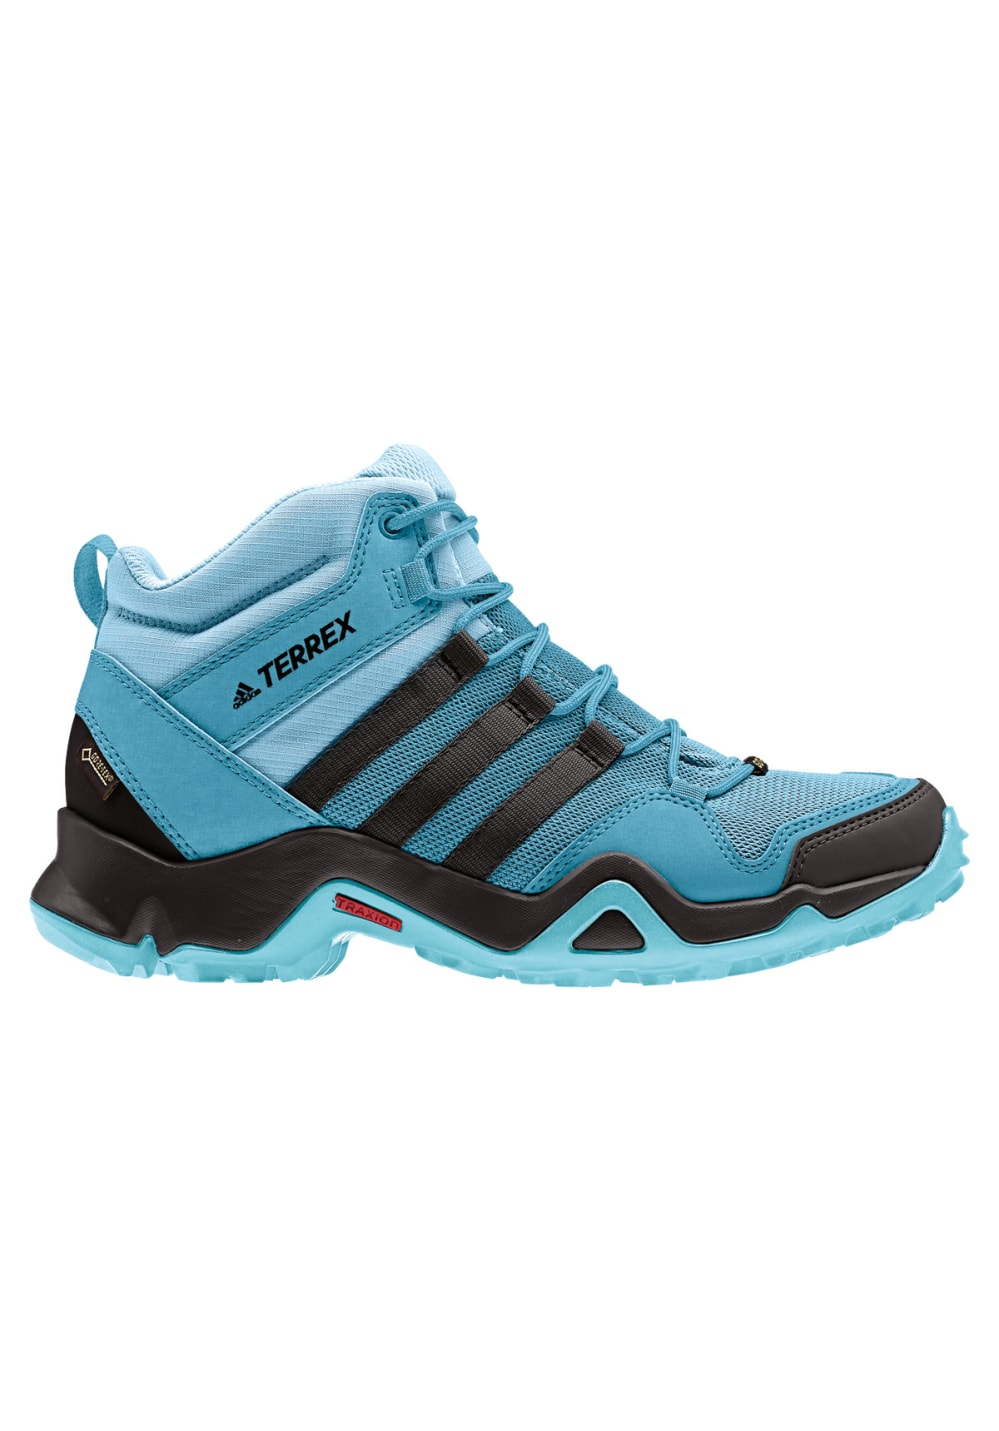 adidas TERREX AX2R GTX Mid Chaussures randonnée pour Femme Bleu